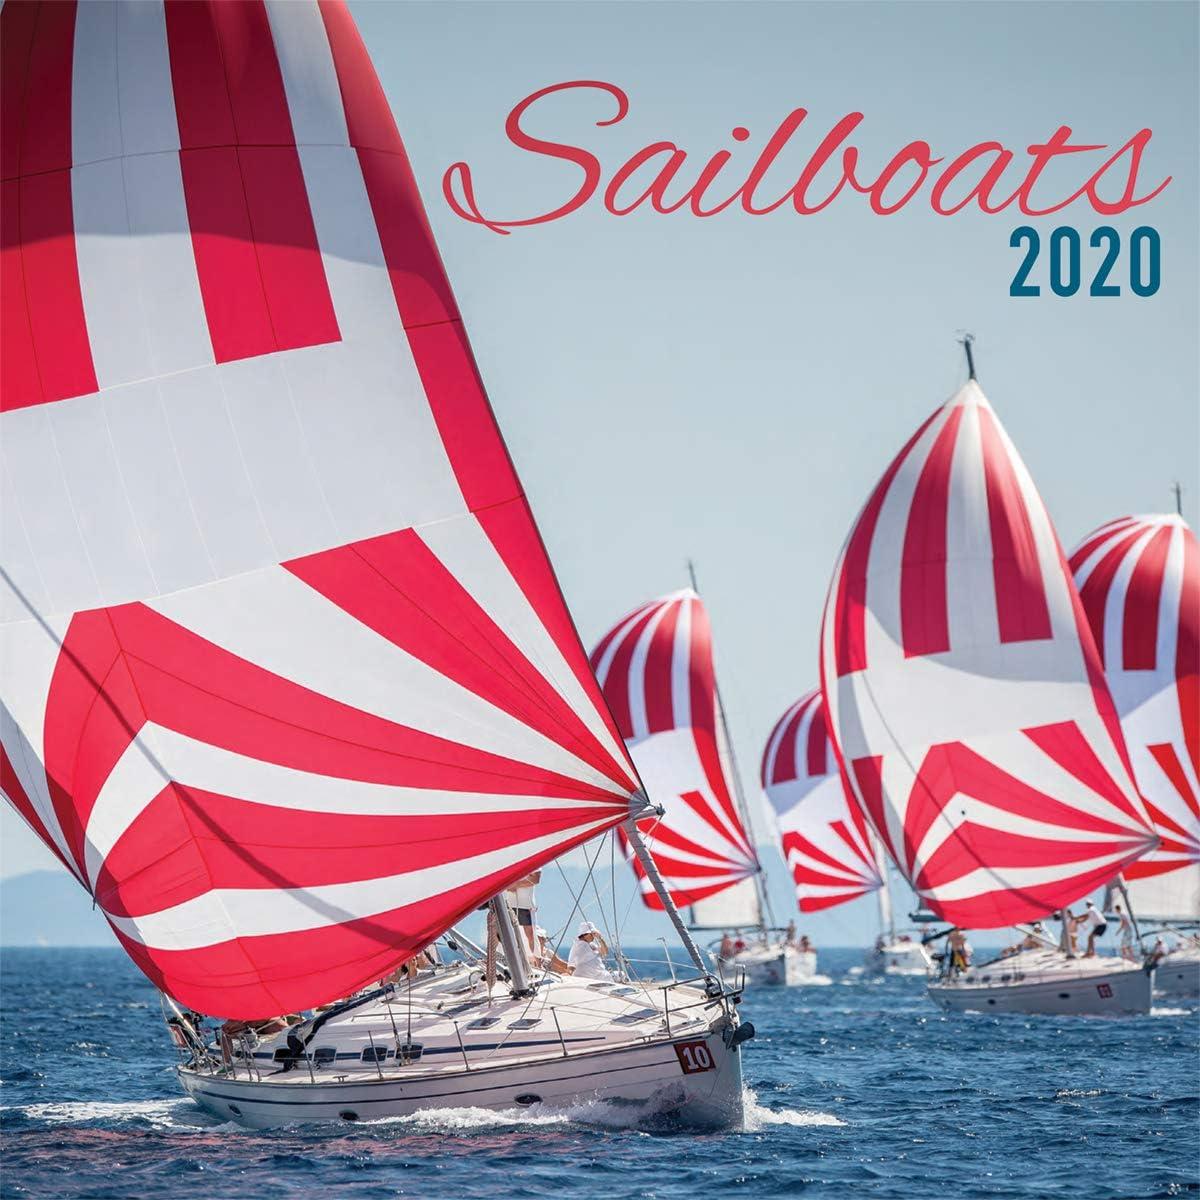 Turner Photo Sailboats 2020 12X12 Photo Wall Calendar 20998940049